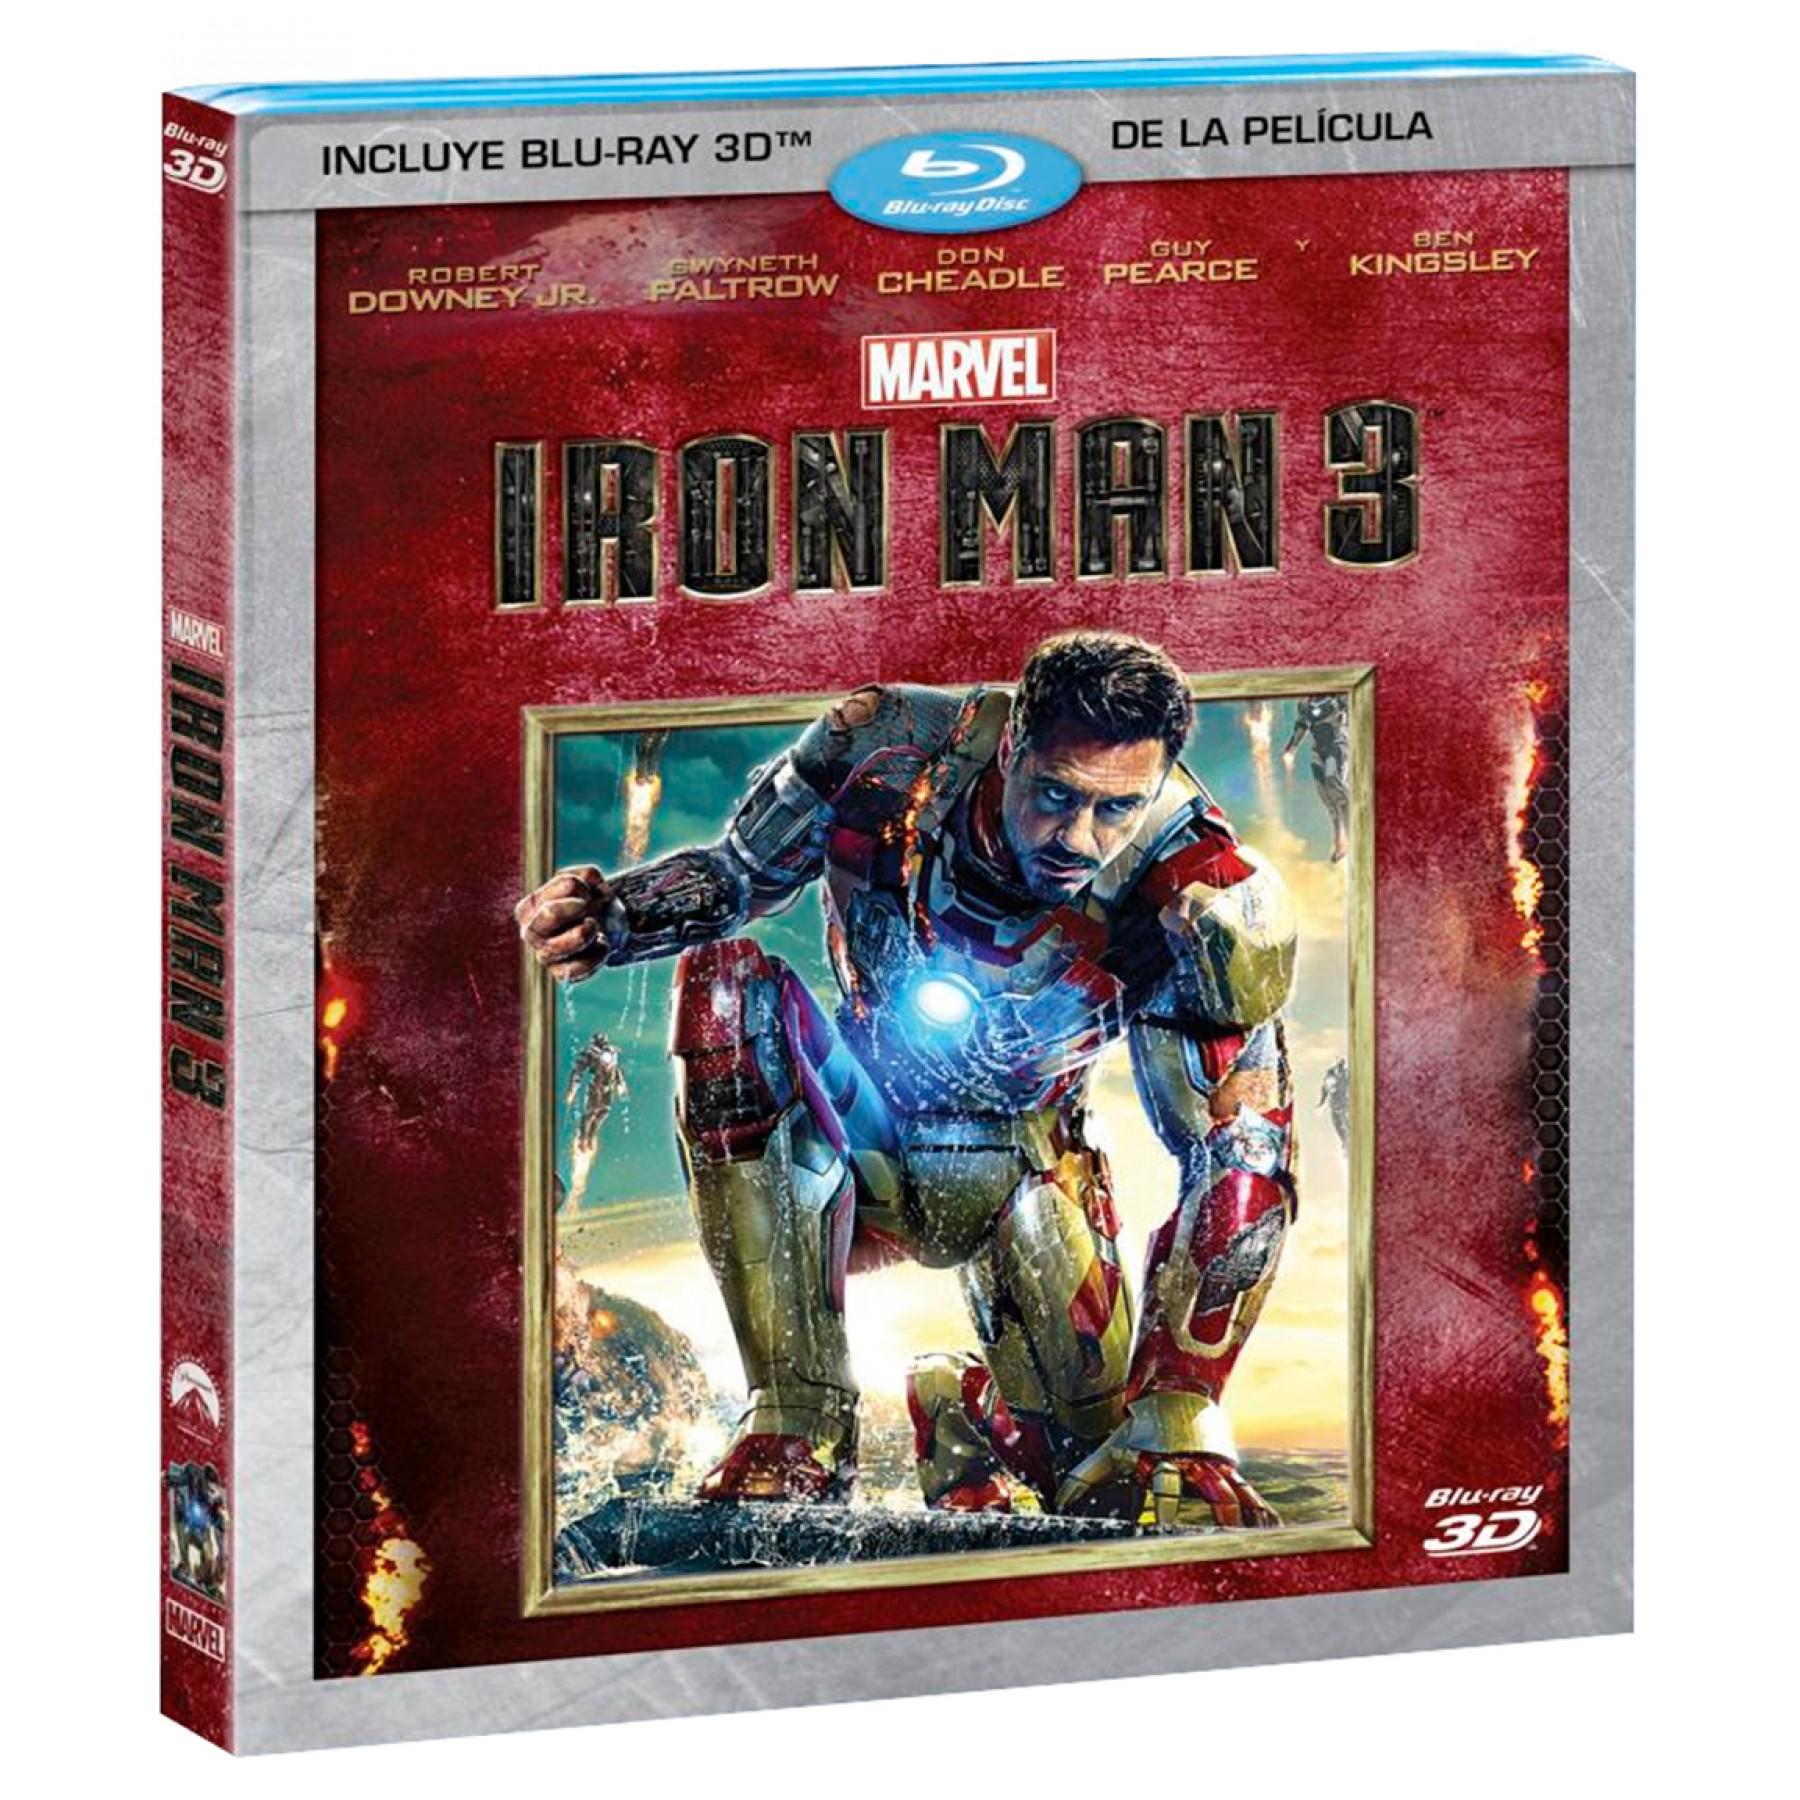 Palacio de Hierro: Blu-ray Ironman 3D a $138, Blu-ray 3D La Sirenita a $120